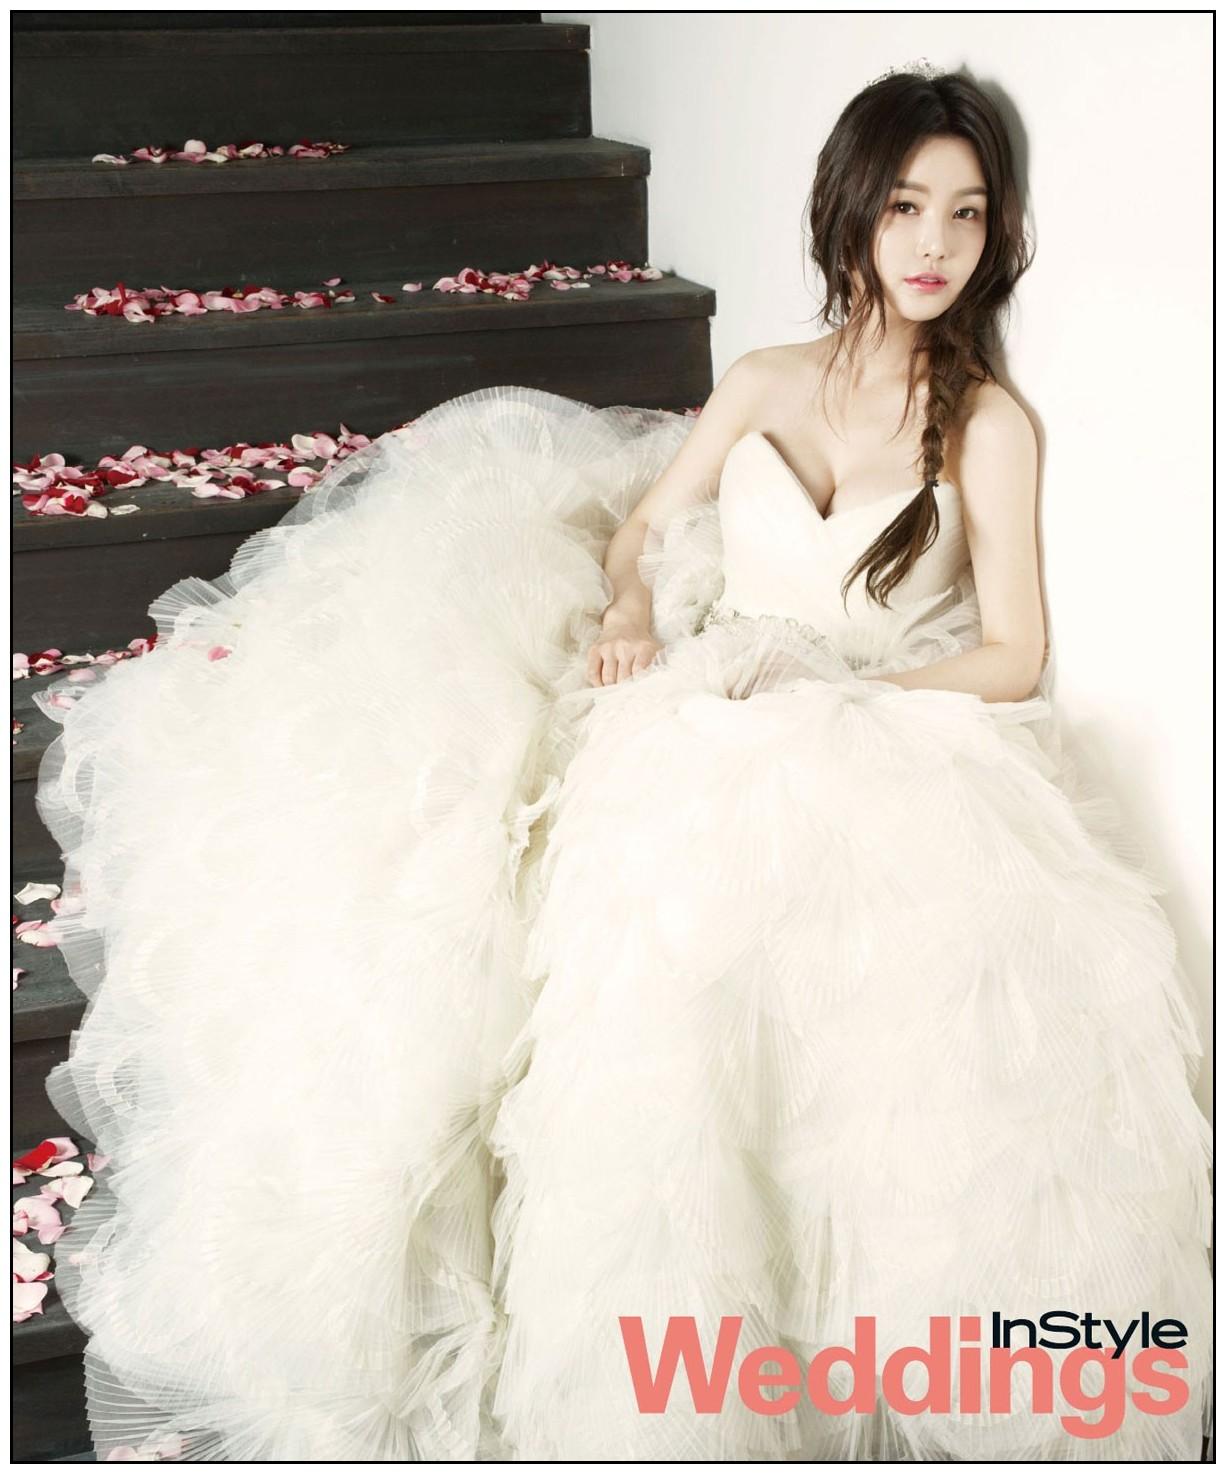 Bridal Gowns Ri : Wedding dresses in ri list of